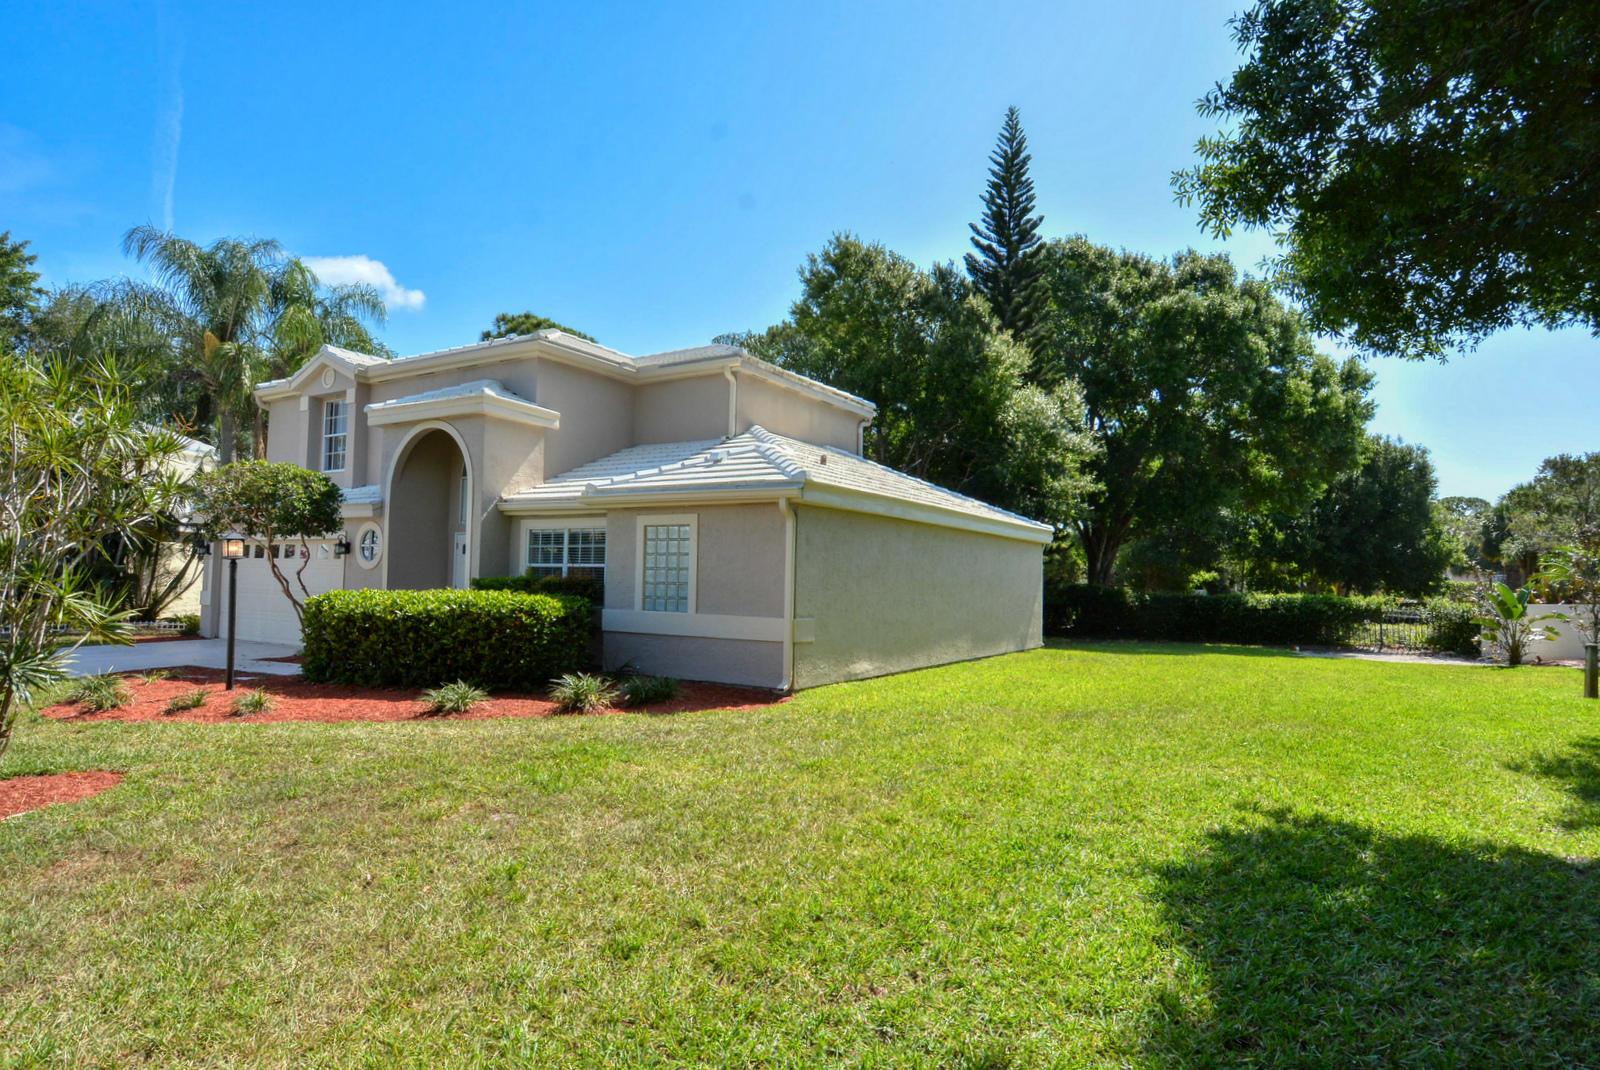 Home for sale in NORTH PASSAGE PLAT NO 2 Tequesta Florida